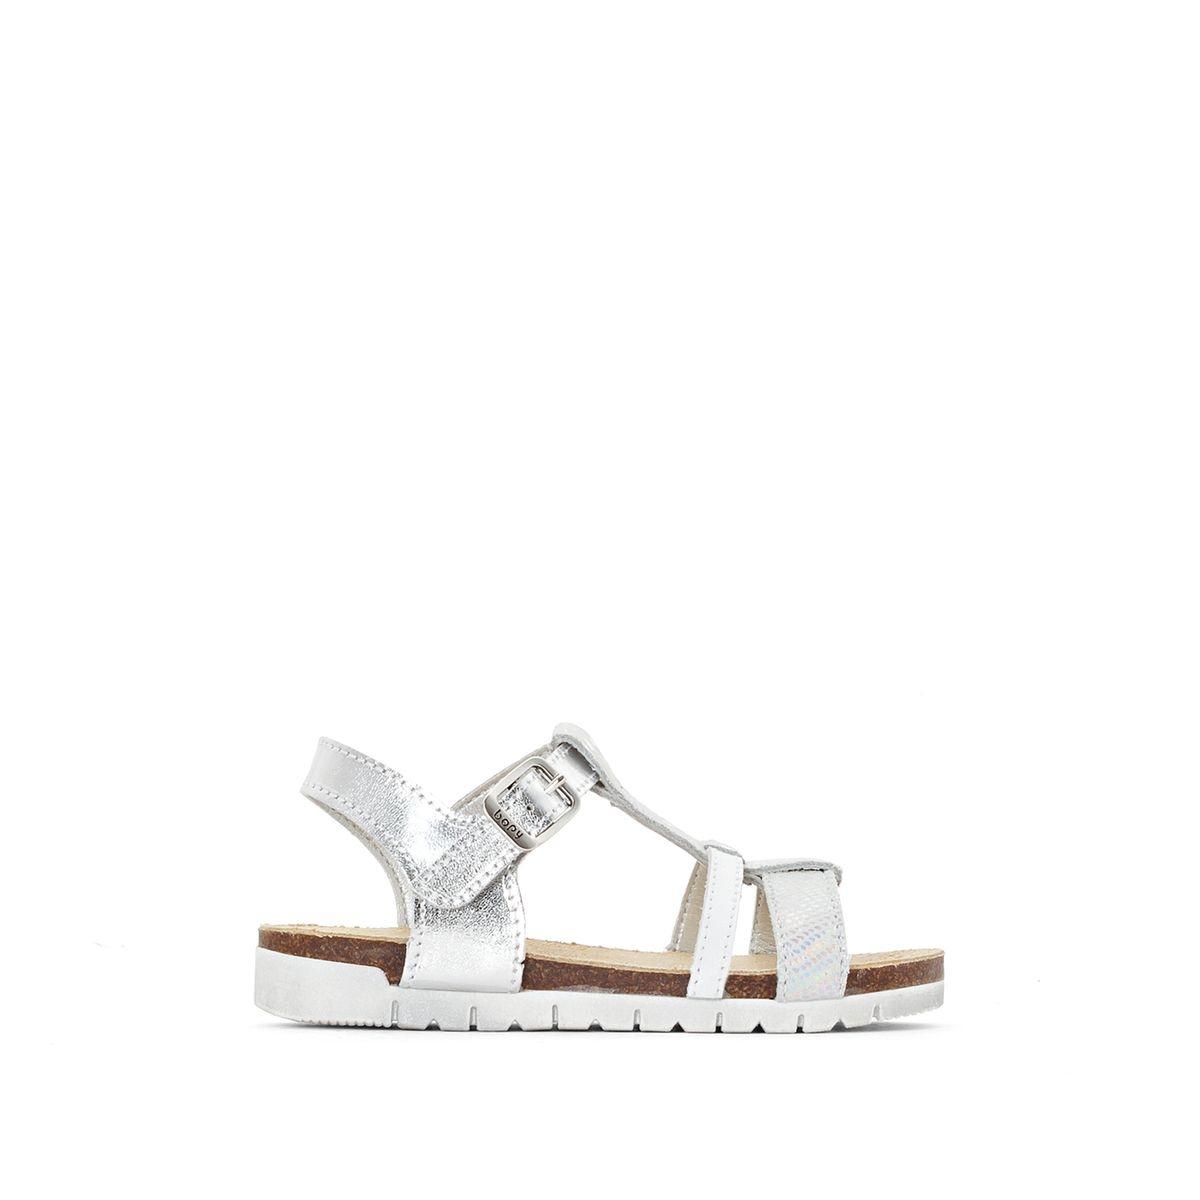 Sandales cuir irisées Eclo